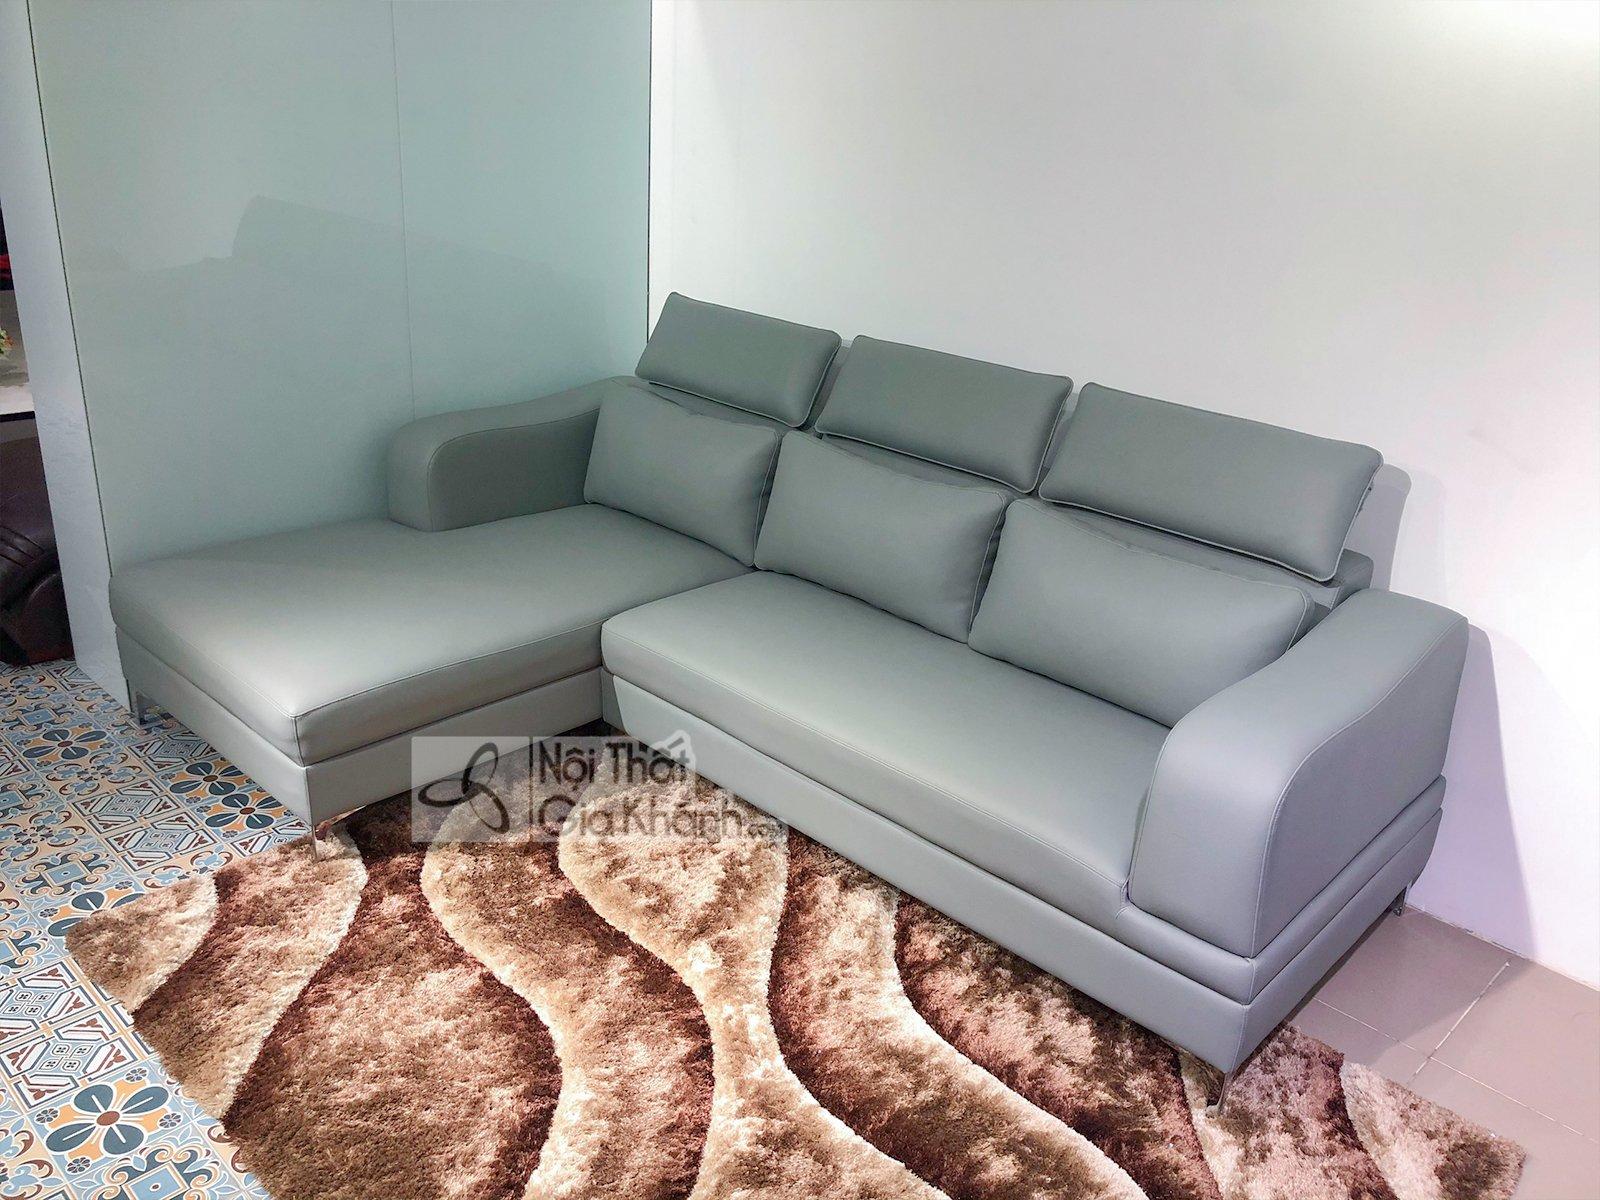 Sofa da đẹp cho phòng khách SP0820-2-G1